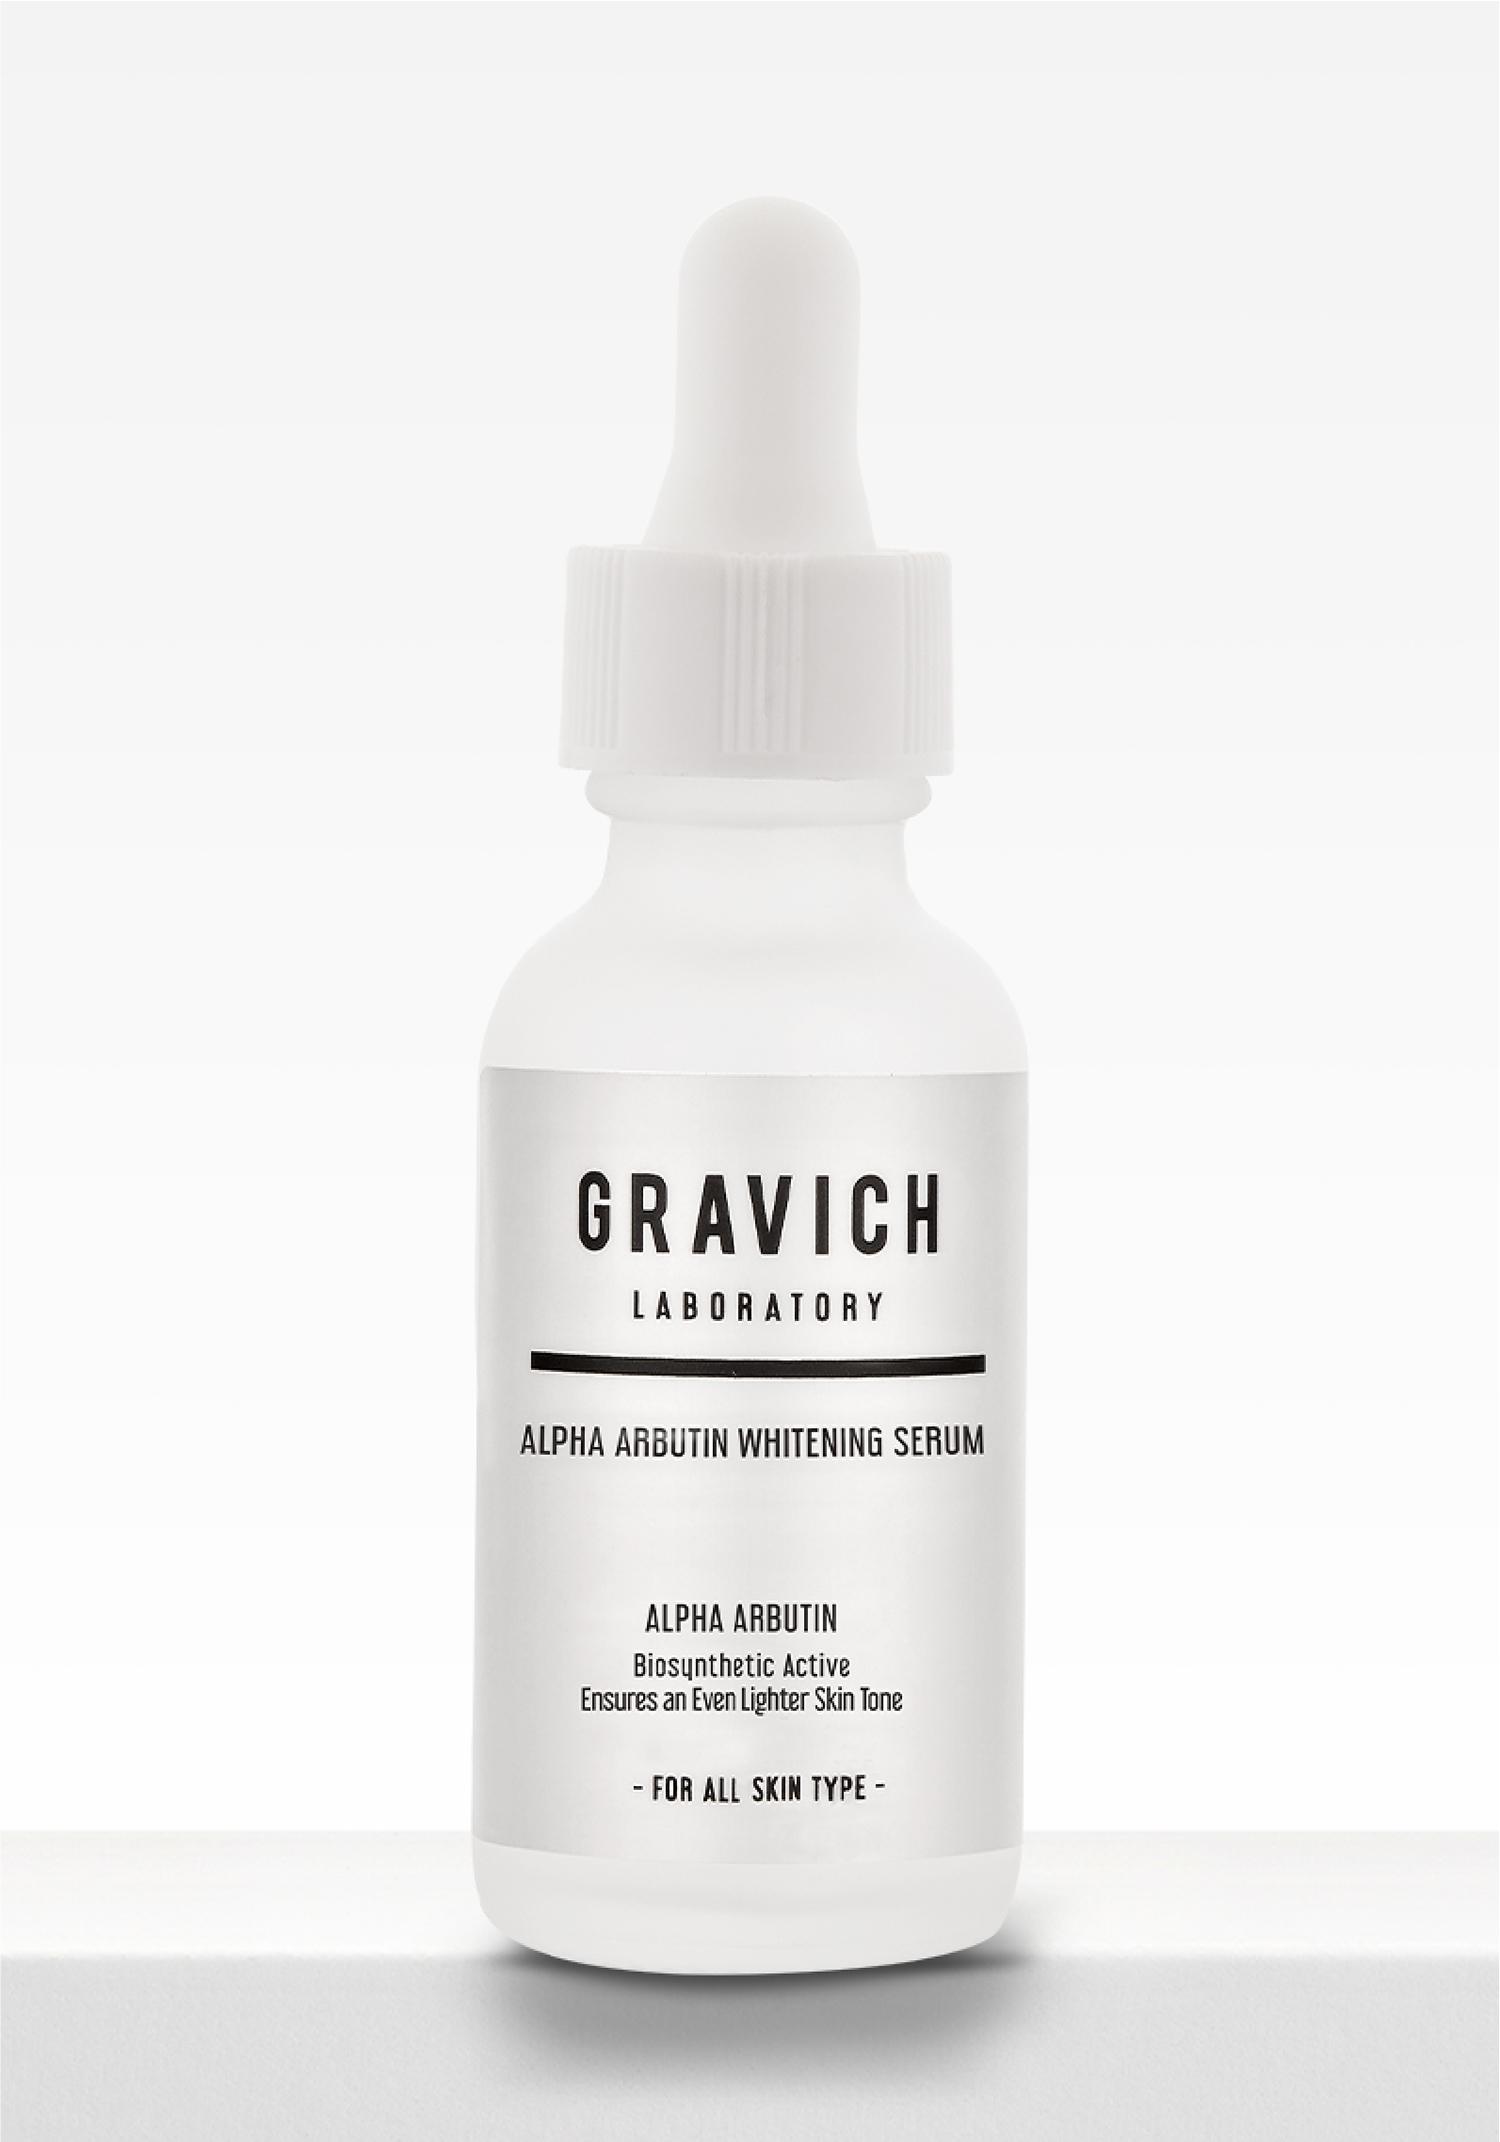 Gravich Alpha Arbutin Whitening Serum 30 Ml